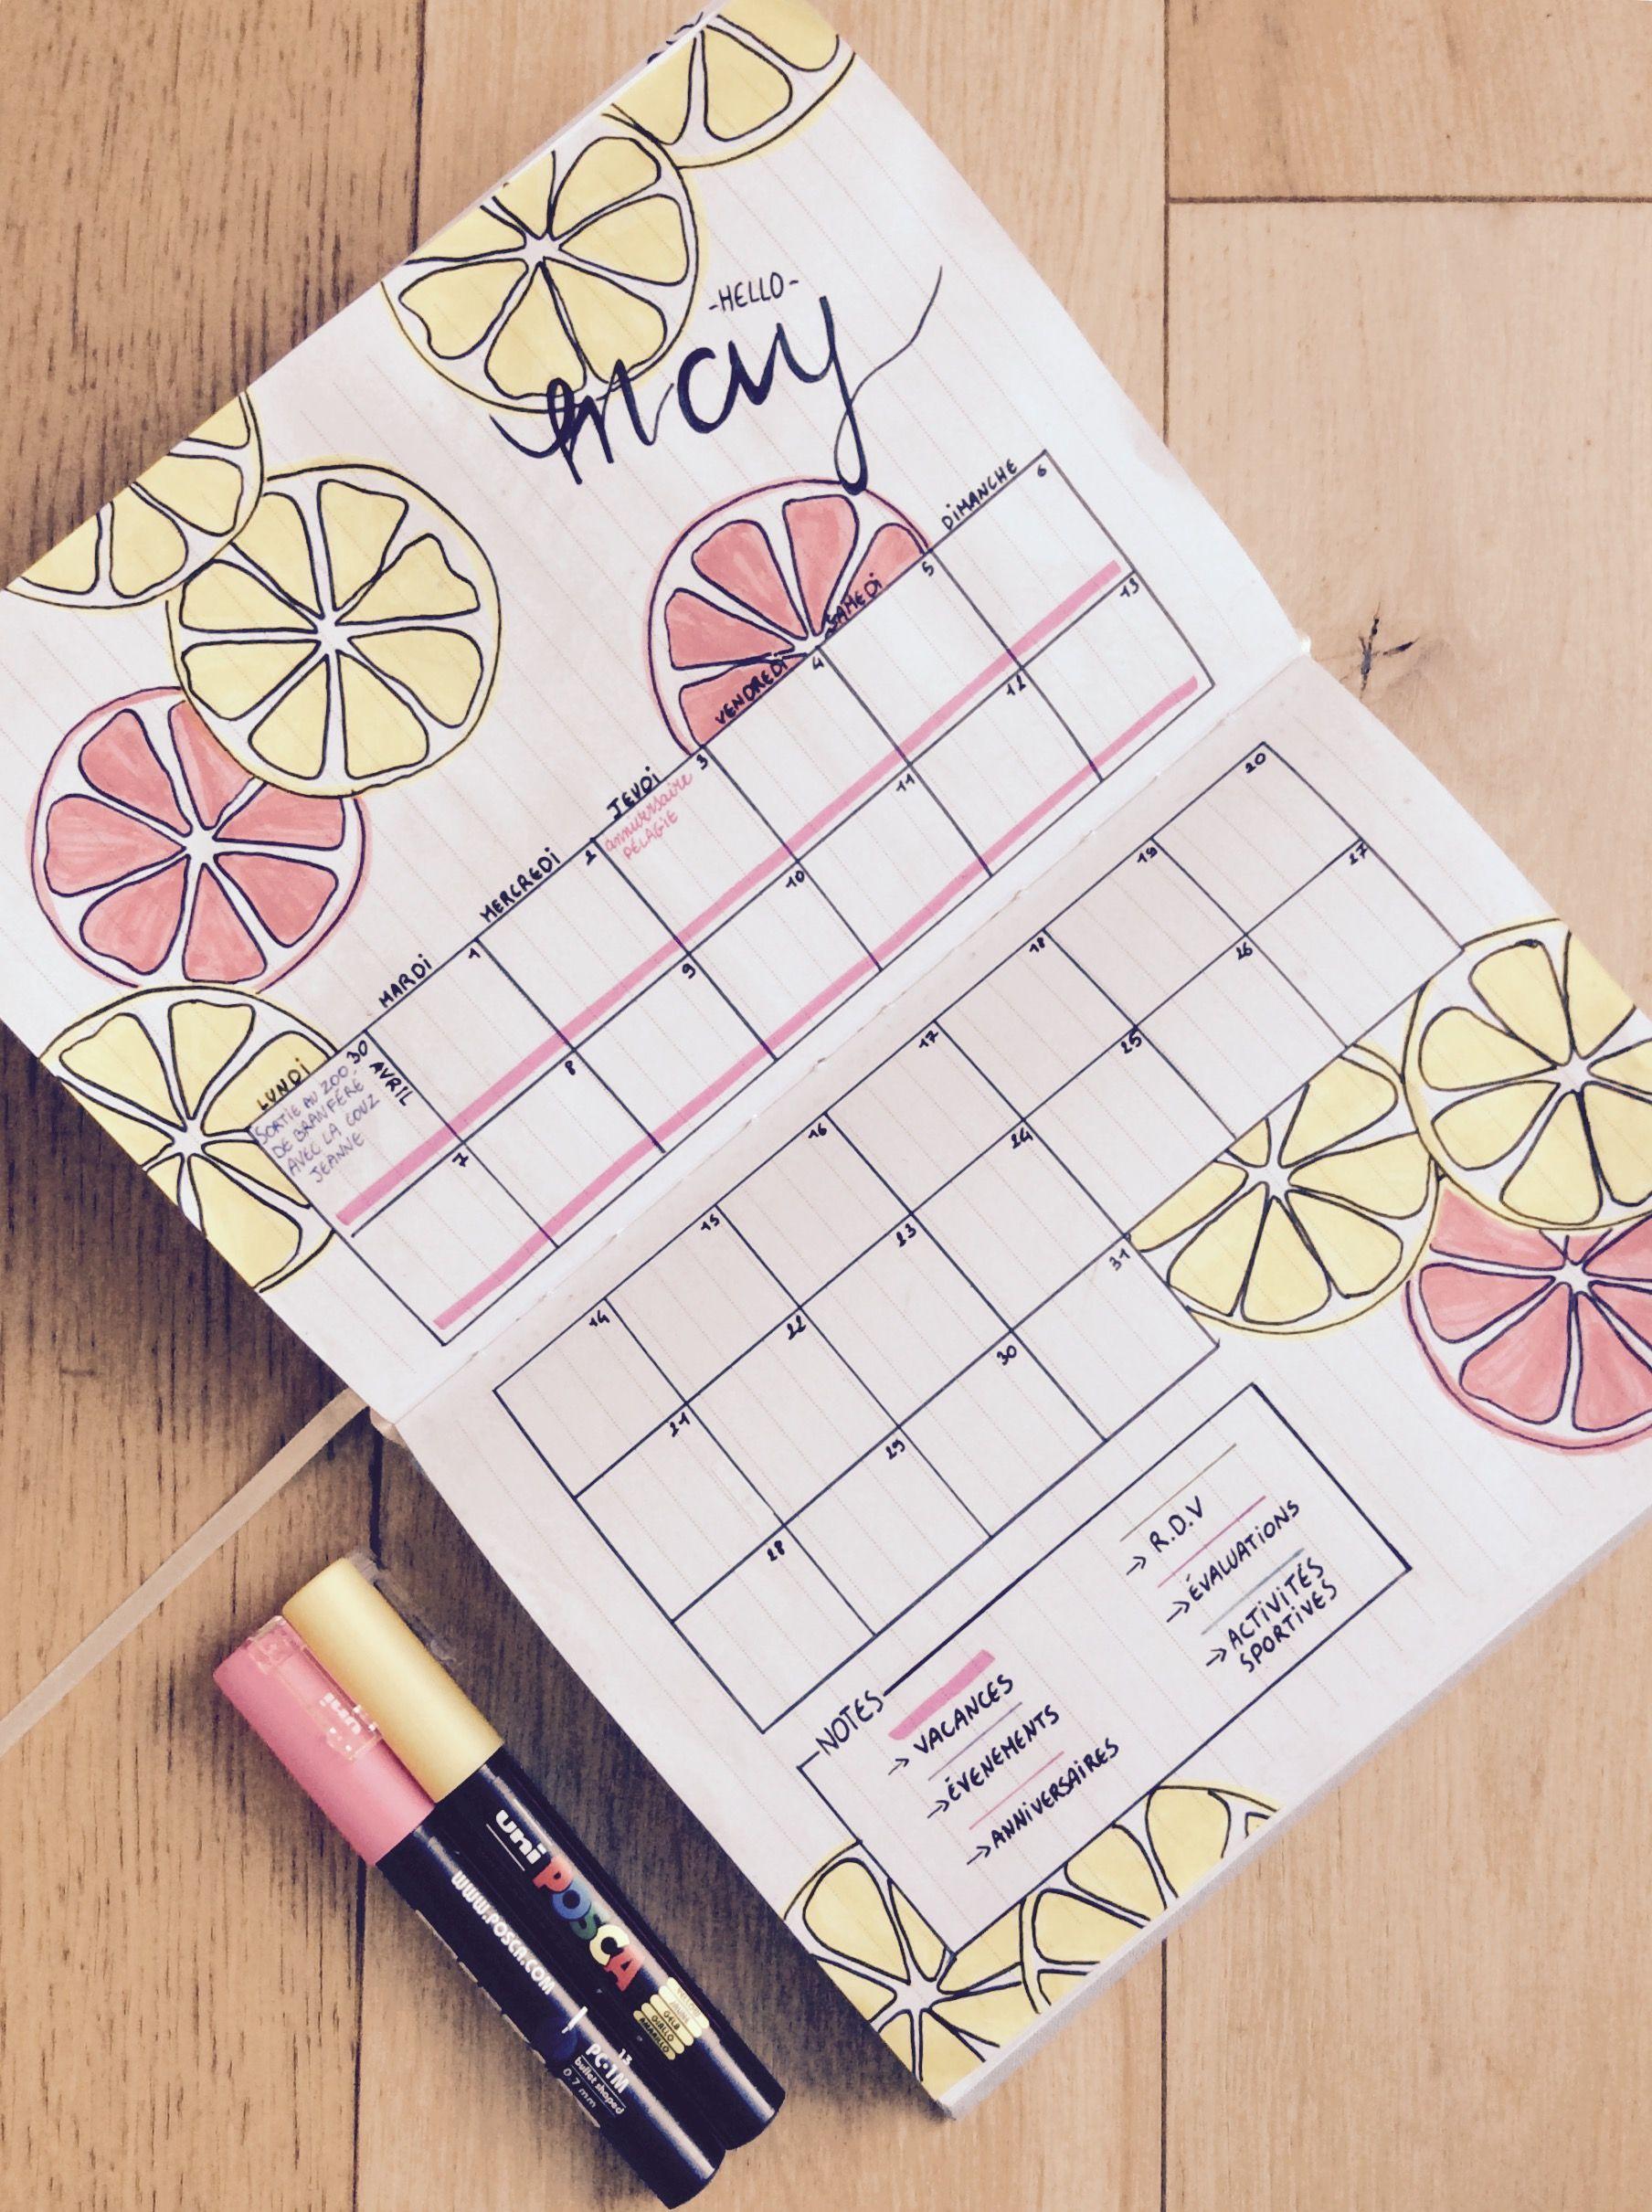 Calendrier Pinterest.Mon Bullet Journal Mois De Mai 2018 Calendrier Fruite